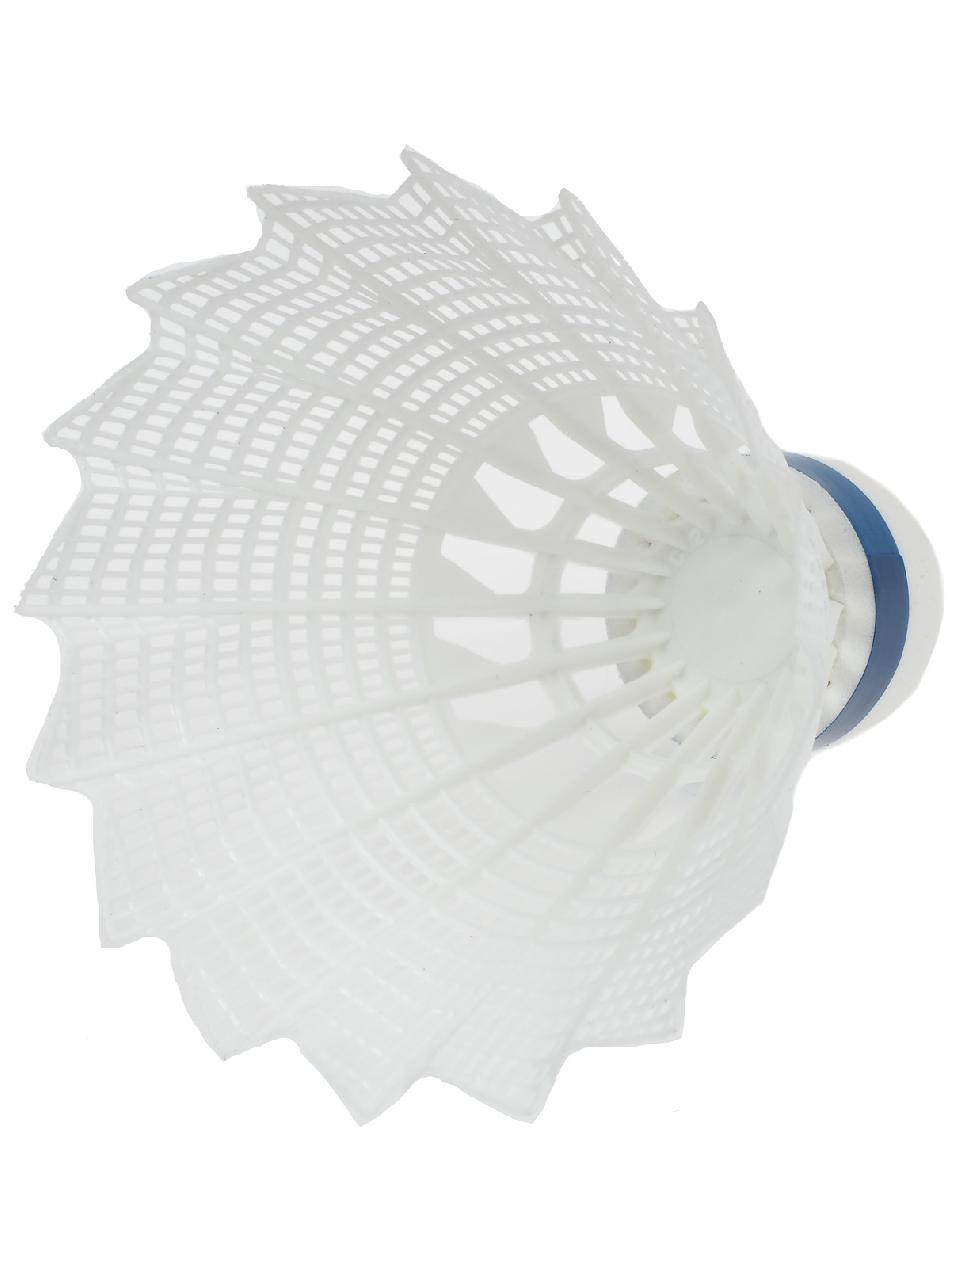 Volants-badminton-Babolat-Practice-volant-blanc-Blanc-70896-Neuf